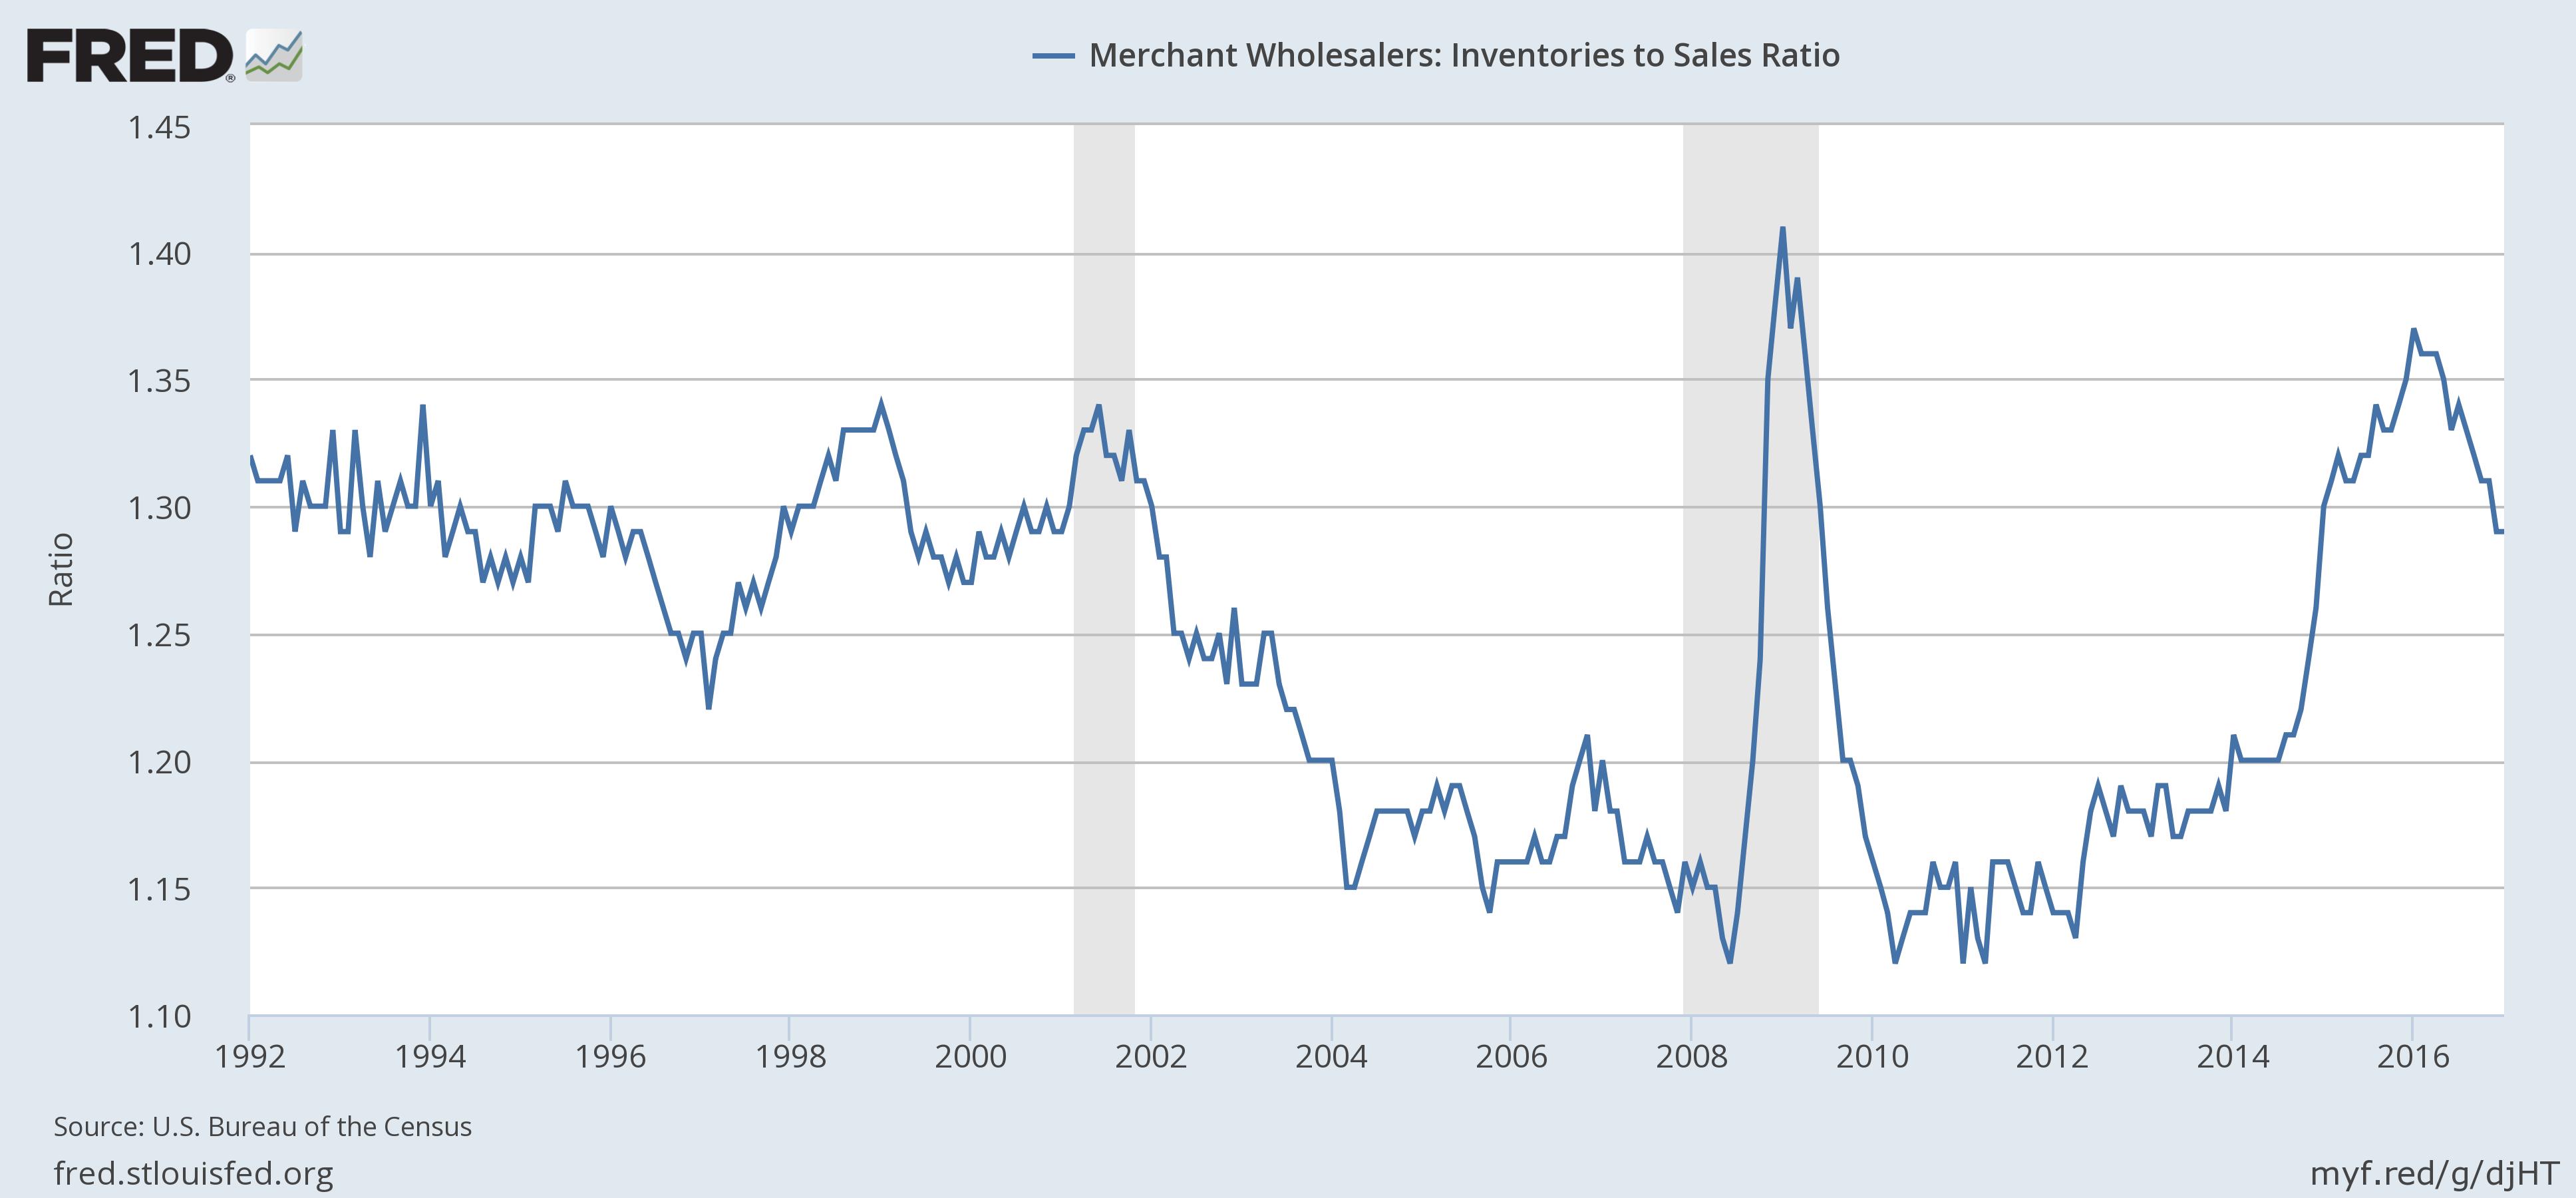 Wholesale Inventories, 1992 - 2016